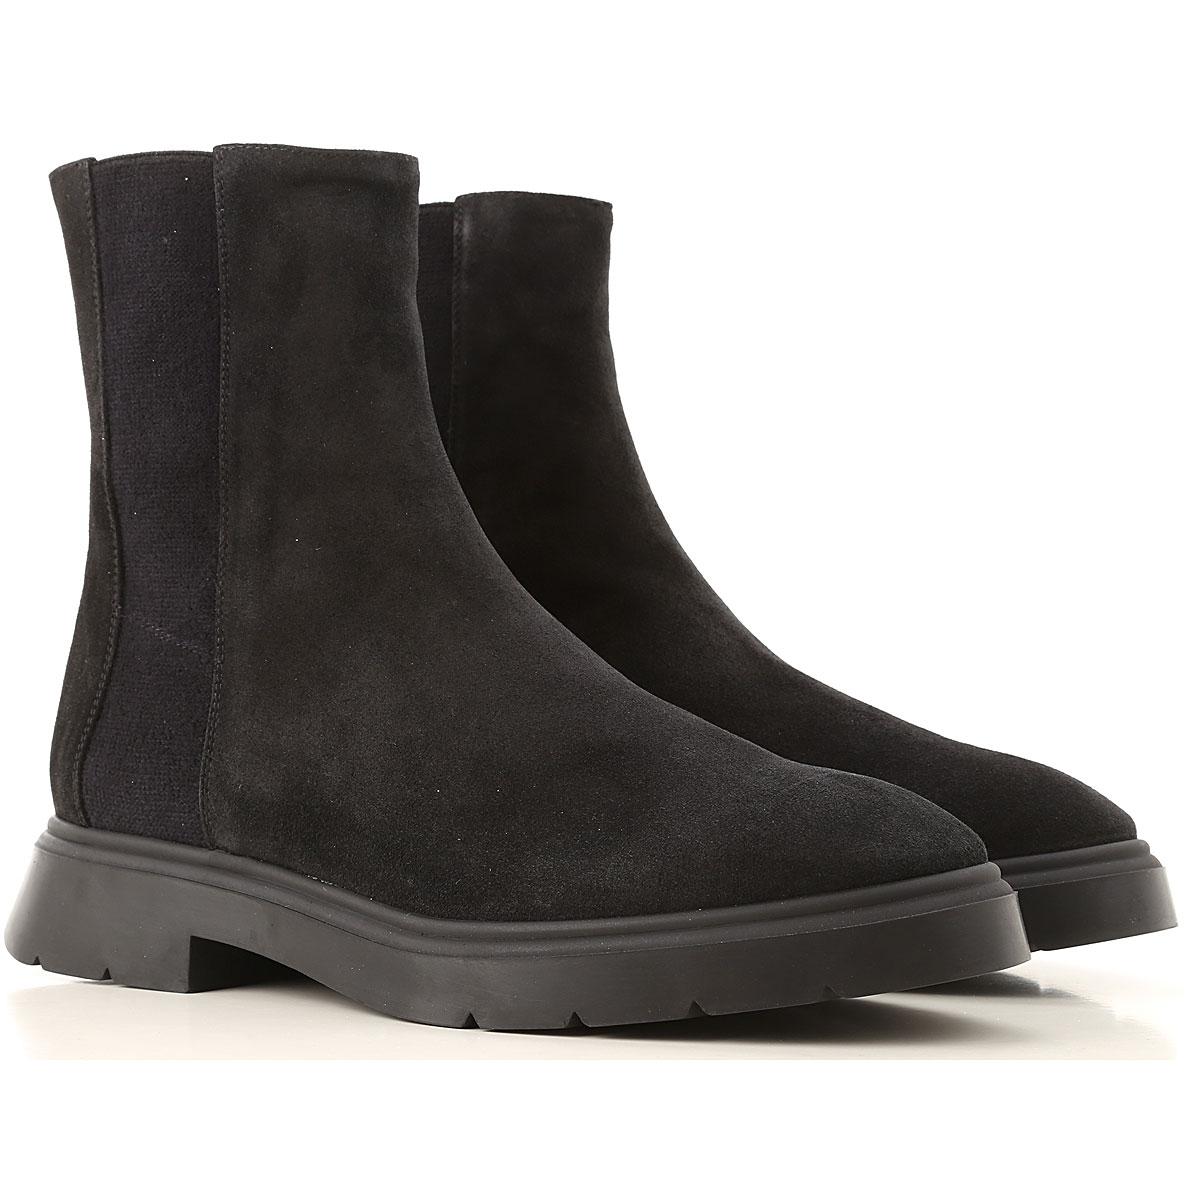 Stuart Weitzman Boots for Women, Booties On Sale, Black, Suede leather, 2019, US 5 (EU 35.5) US 5.5 (EU 36) US 6 (EU 36.5) US 8.5 (EU 39)